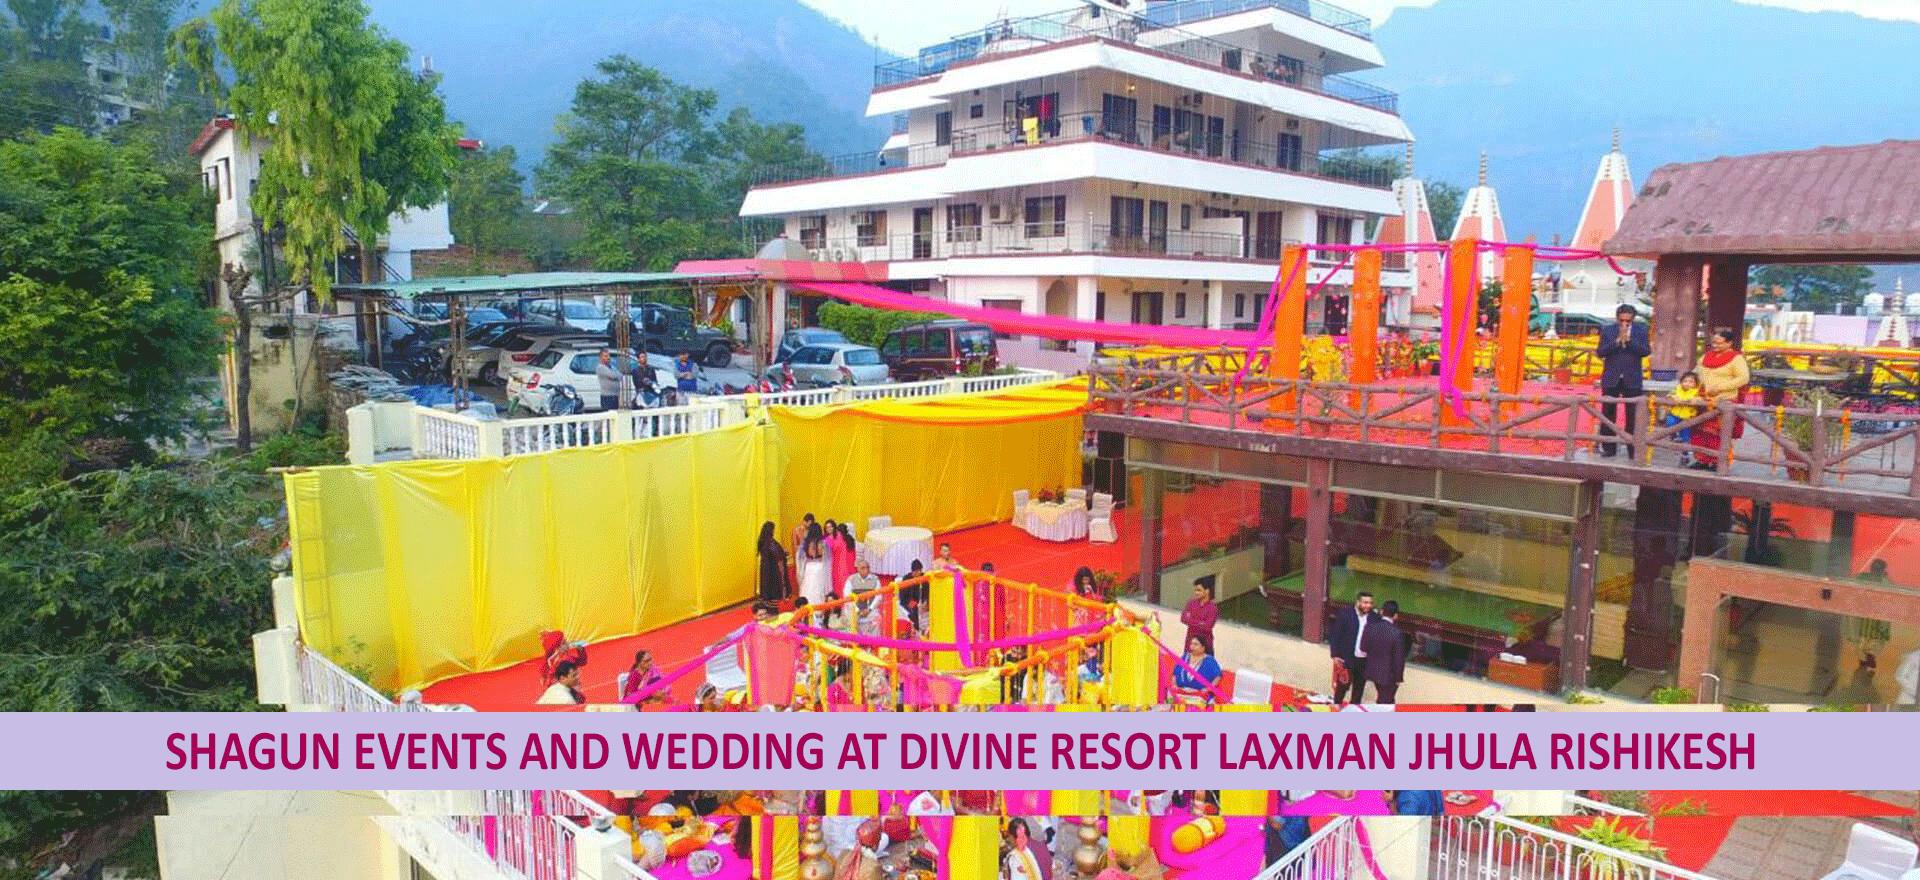 Divine Resort Laxman Jhula Rishikesh